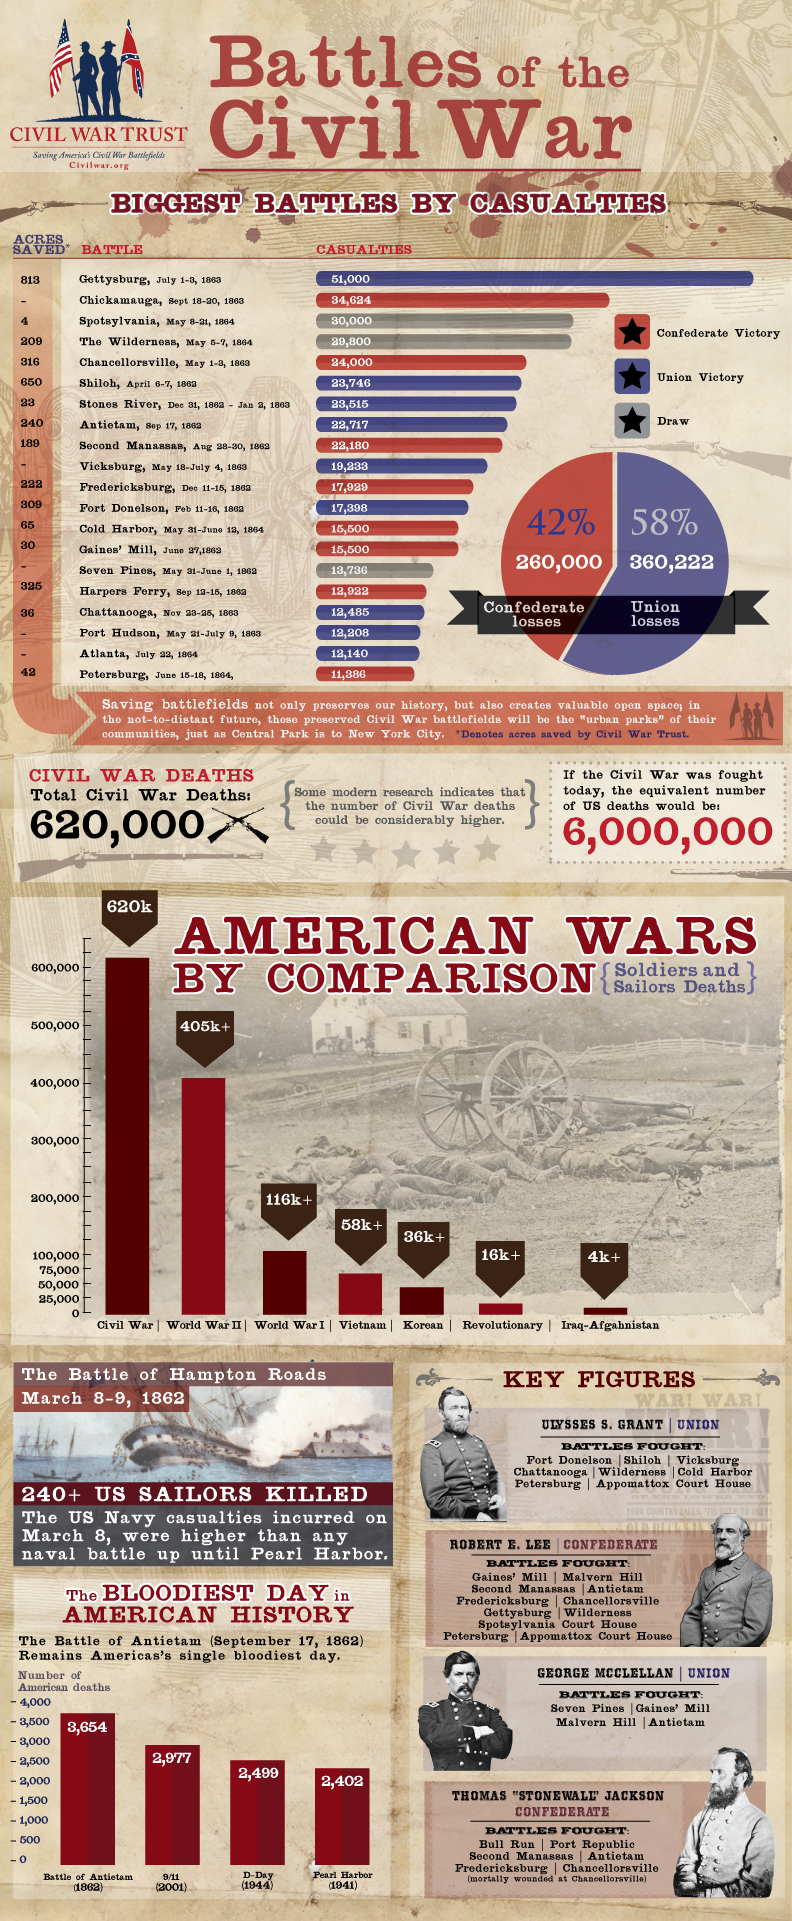 u201cBattles of the Civil Waru201d Infographic - Civil War Battle PNG